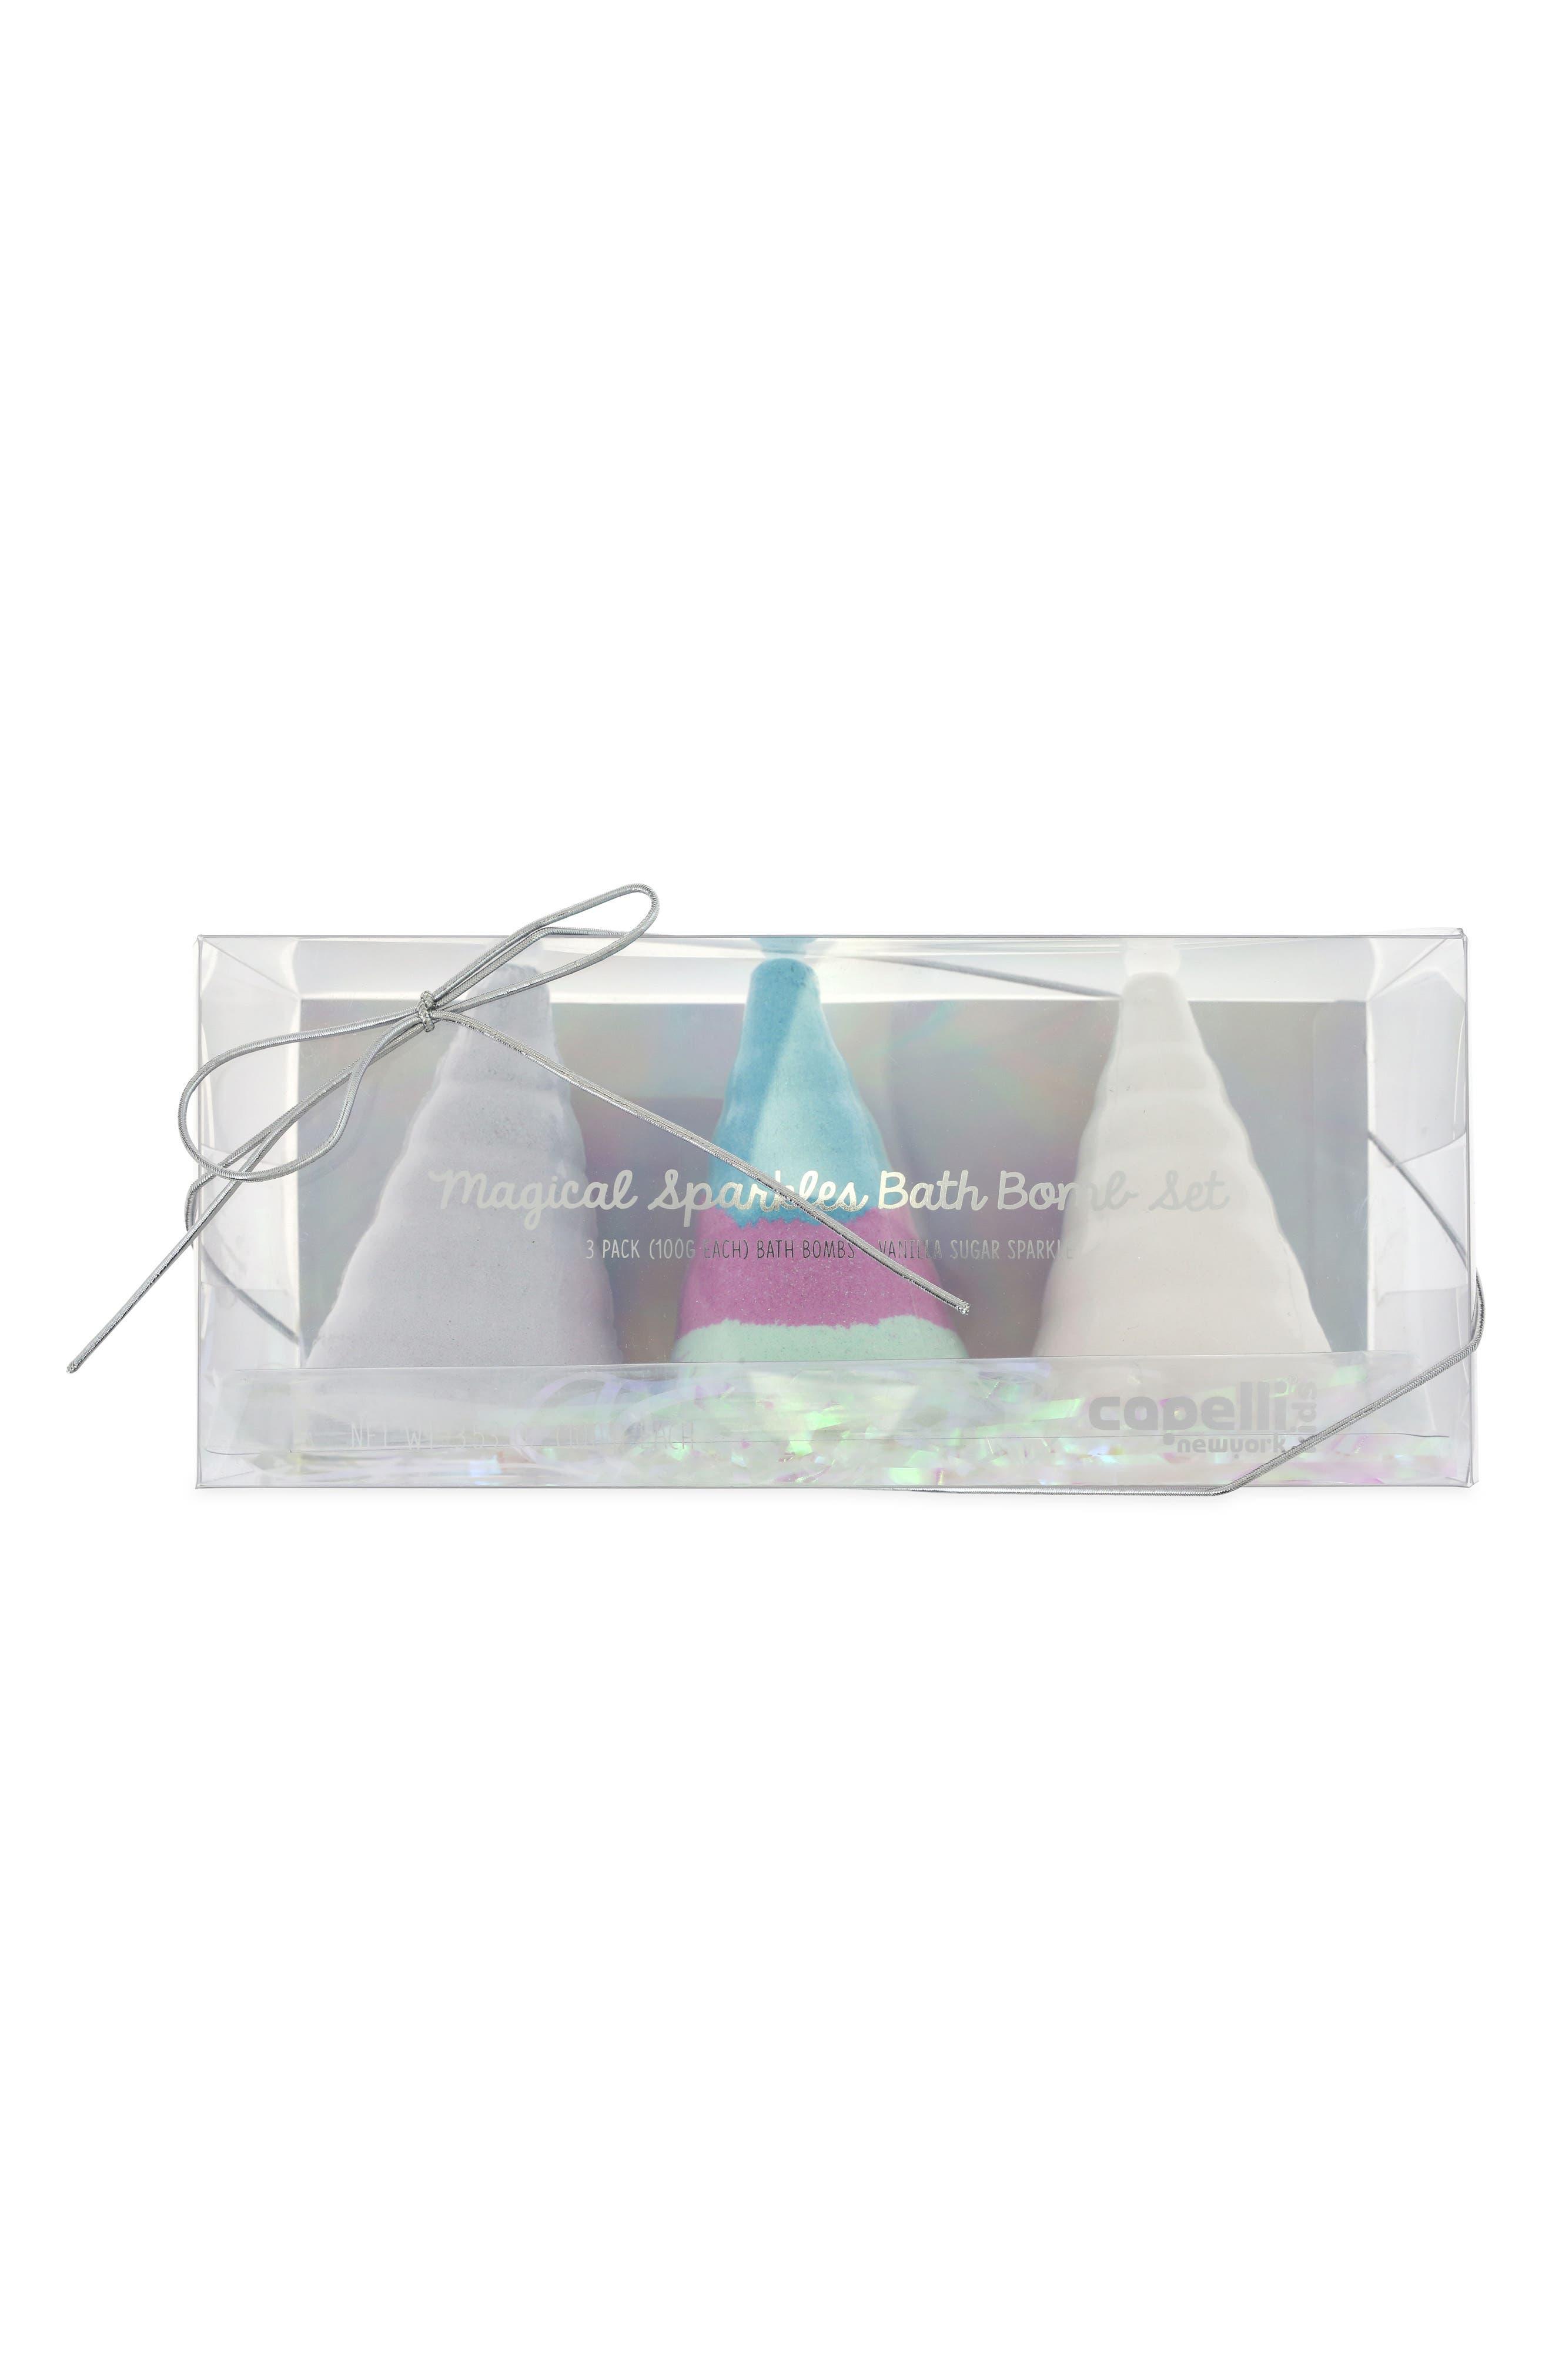 Capelli New York 3-Pack Unicorn Bath Fizzie Set